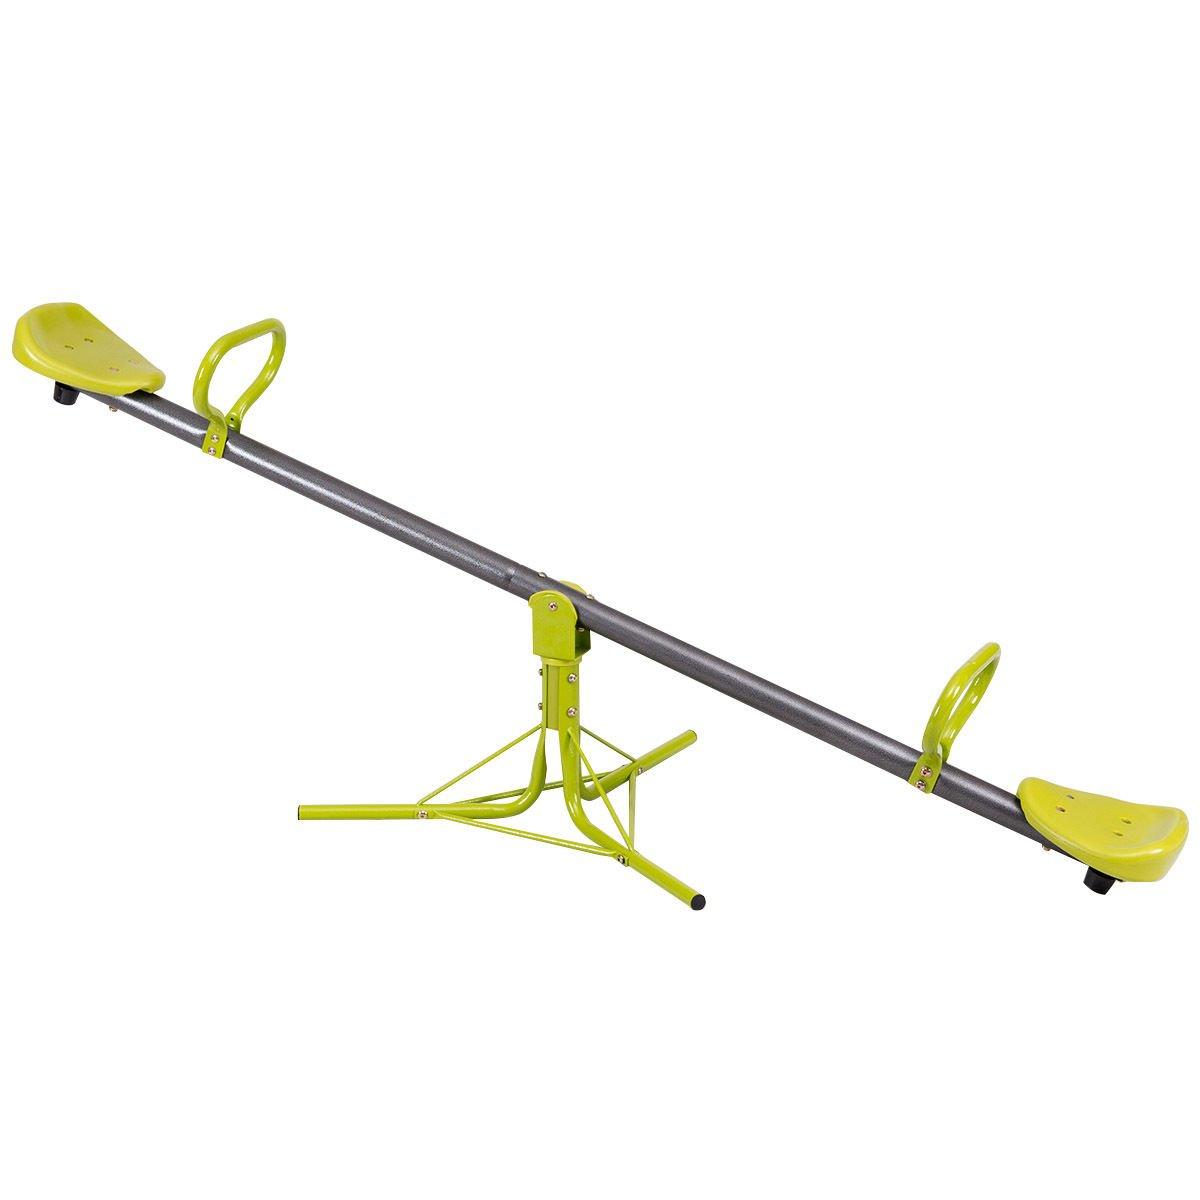 Costzon Kids Seesaw Swivel Teeter Totter Playground Equipment, 360 Degree Rotation Green